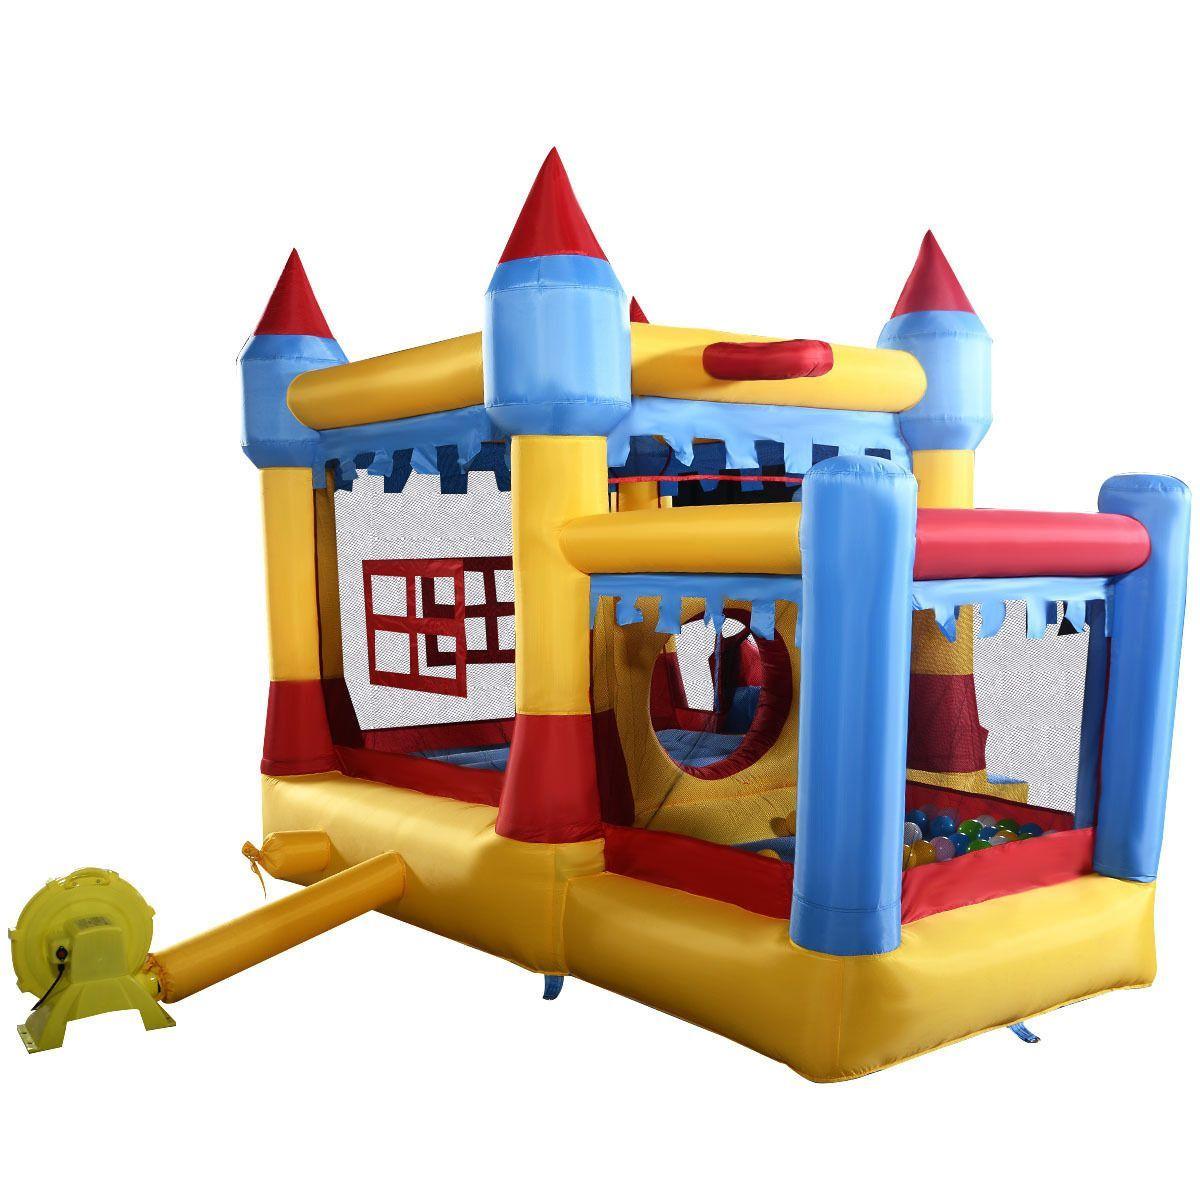 Inflatable Water Slide Rental Kansas City: Inflatable Bounce House Castle Commercial Kids Jumper